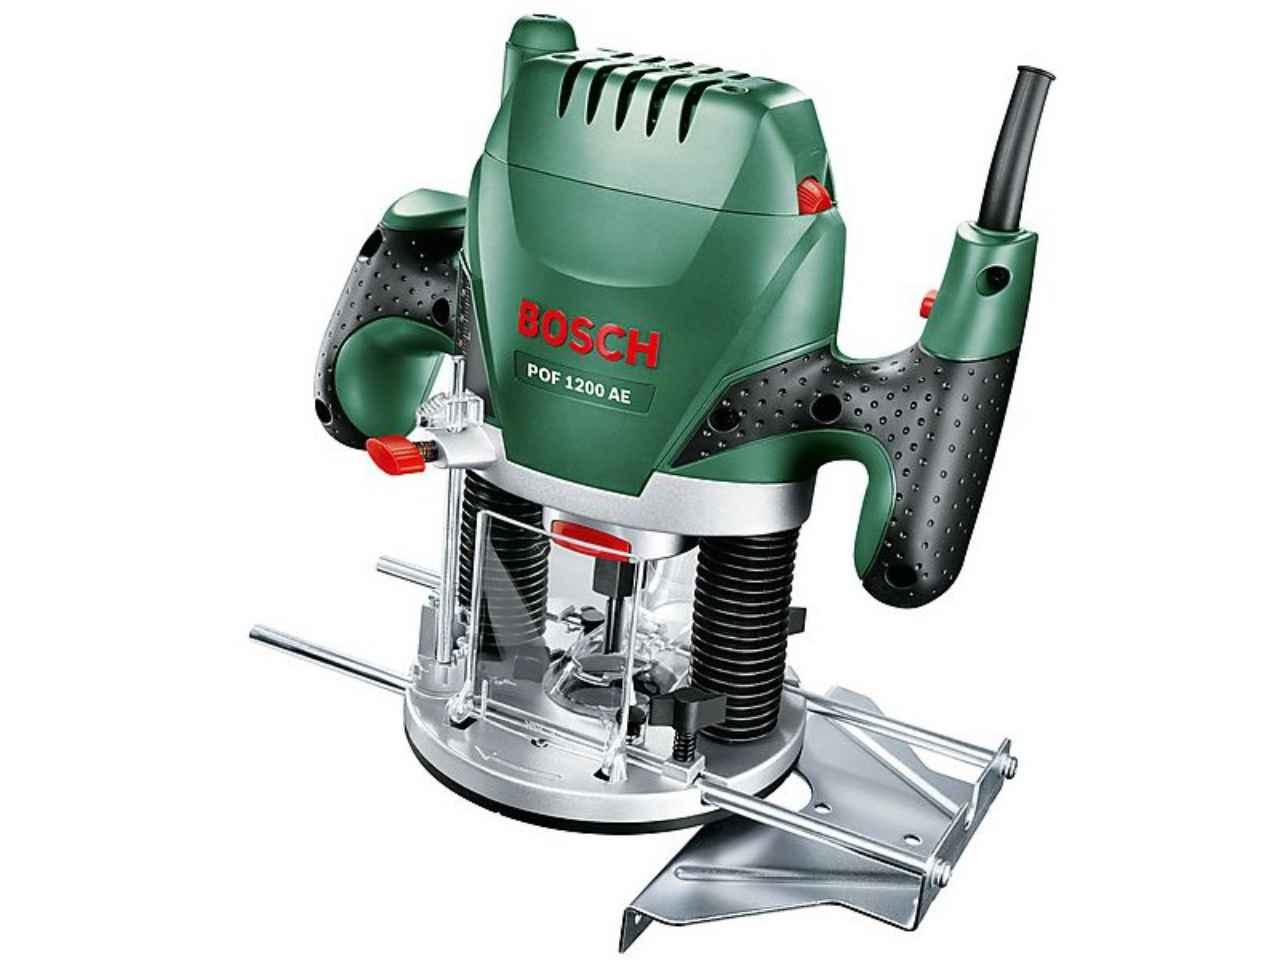 Bosch Green POF 1200 AE 230v 1200w Router